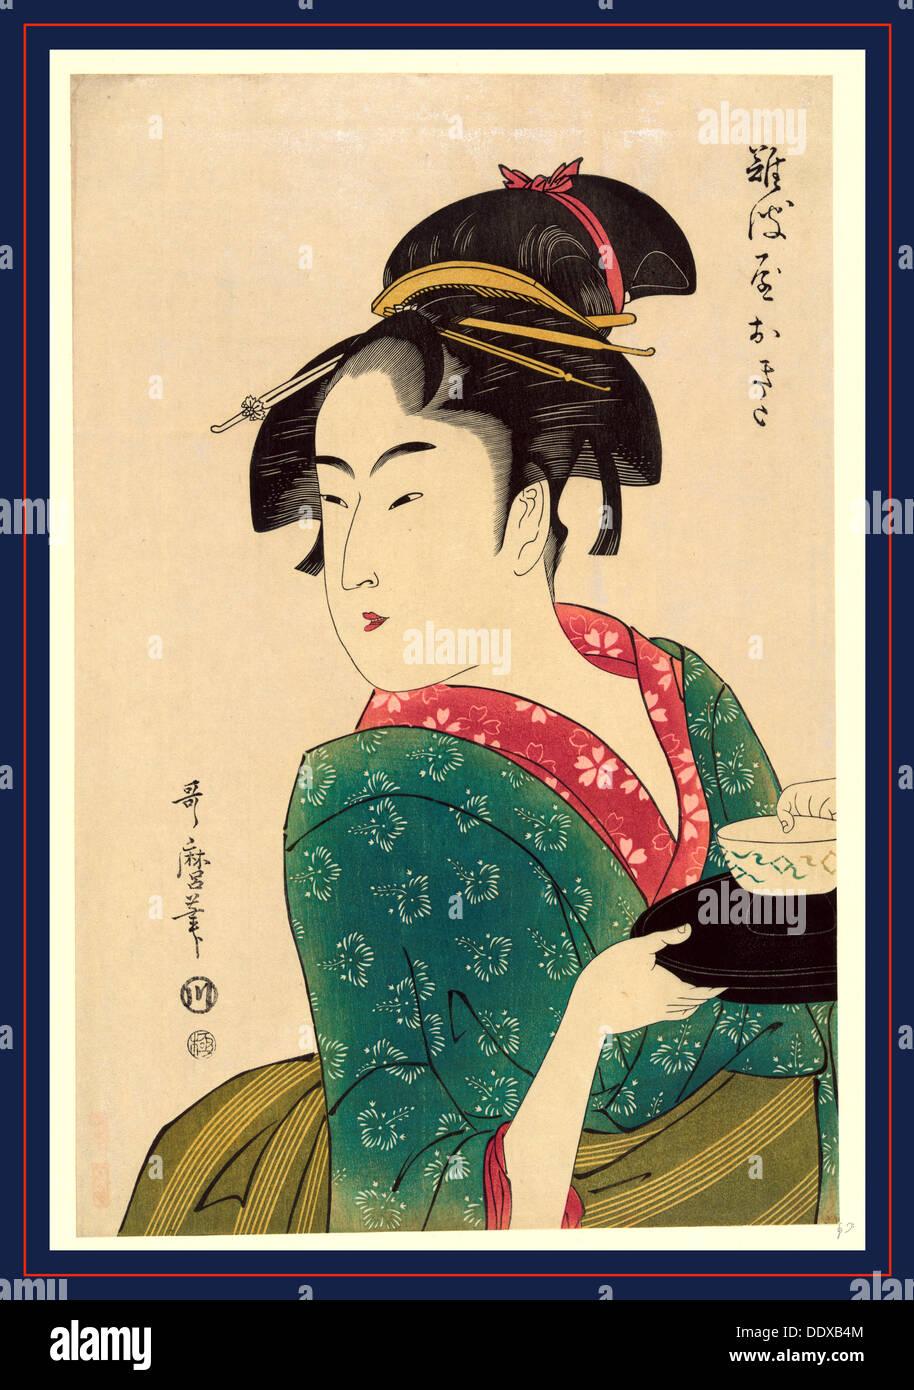 Naniwaya Okita, Okita Naniwa-ya. [1793, später gedruckt], 1 print: Holzschnitt, Farbe, Print zeigt Naniwaya Okita Stockfoto